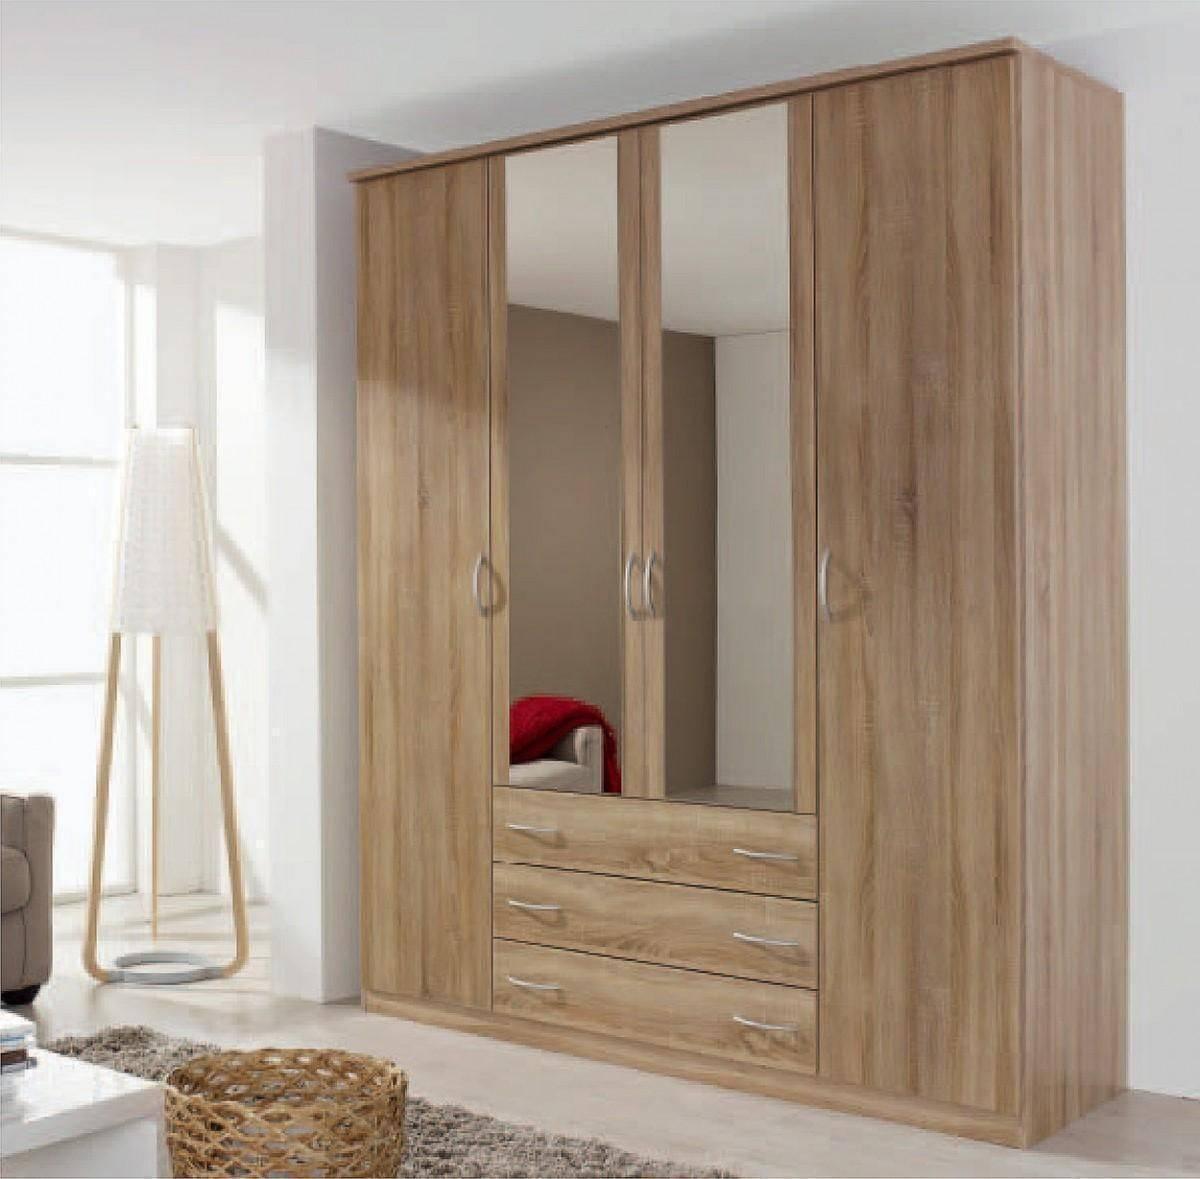 Kent 5 Doors 1 Mirror Wardrobe – 58d9 | Shawn Furniture Inside Kent Wardrobes (View 9 of 15)